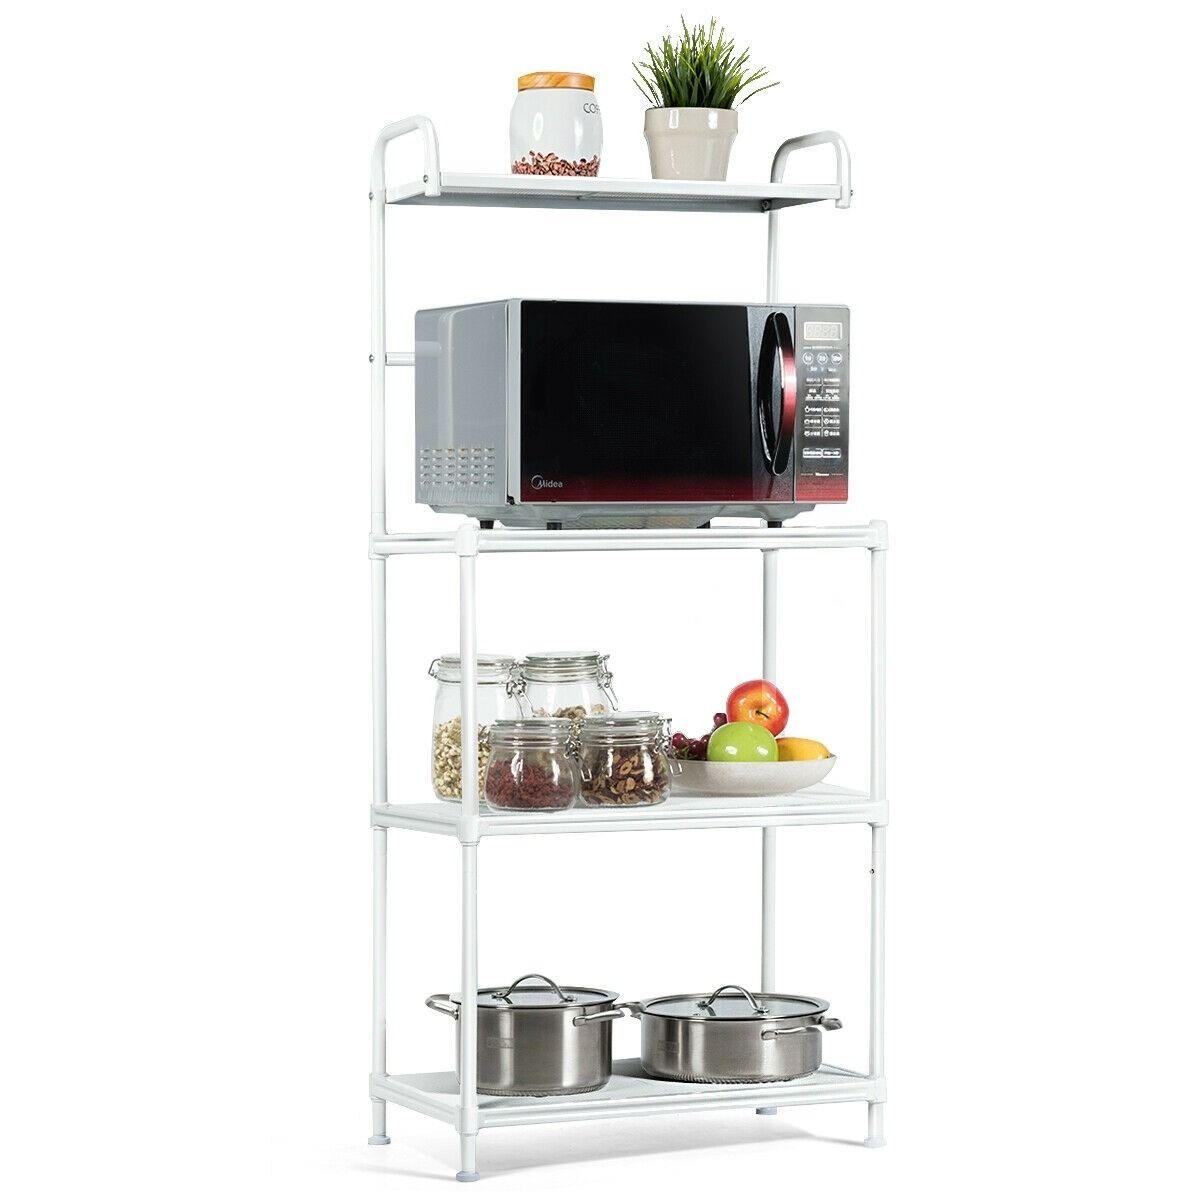 4 Tier Kitchen Storage Baker Microwave Oven Rack Shelves Kitchen